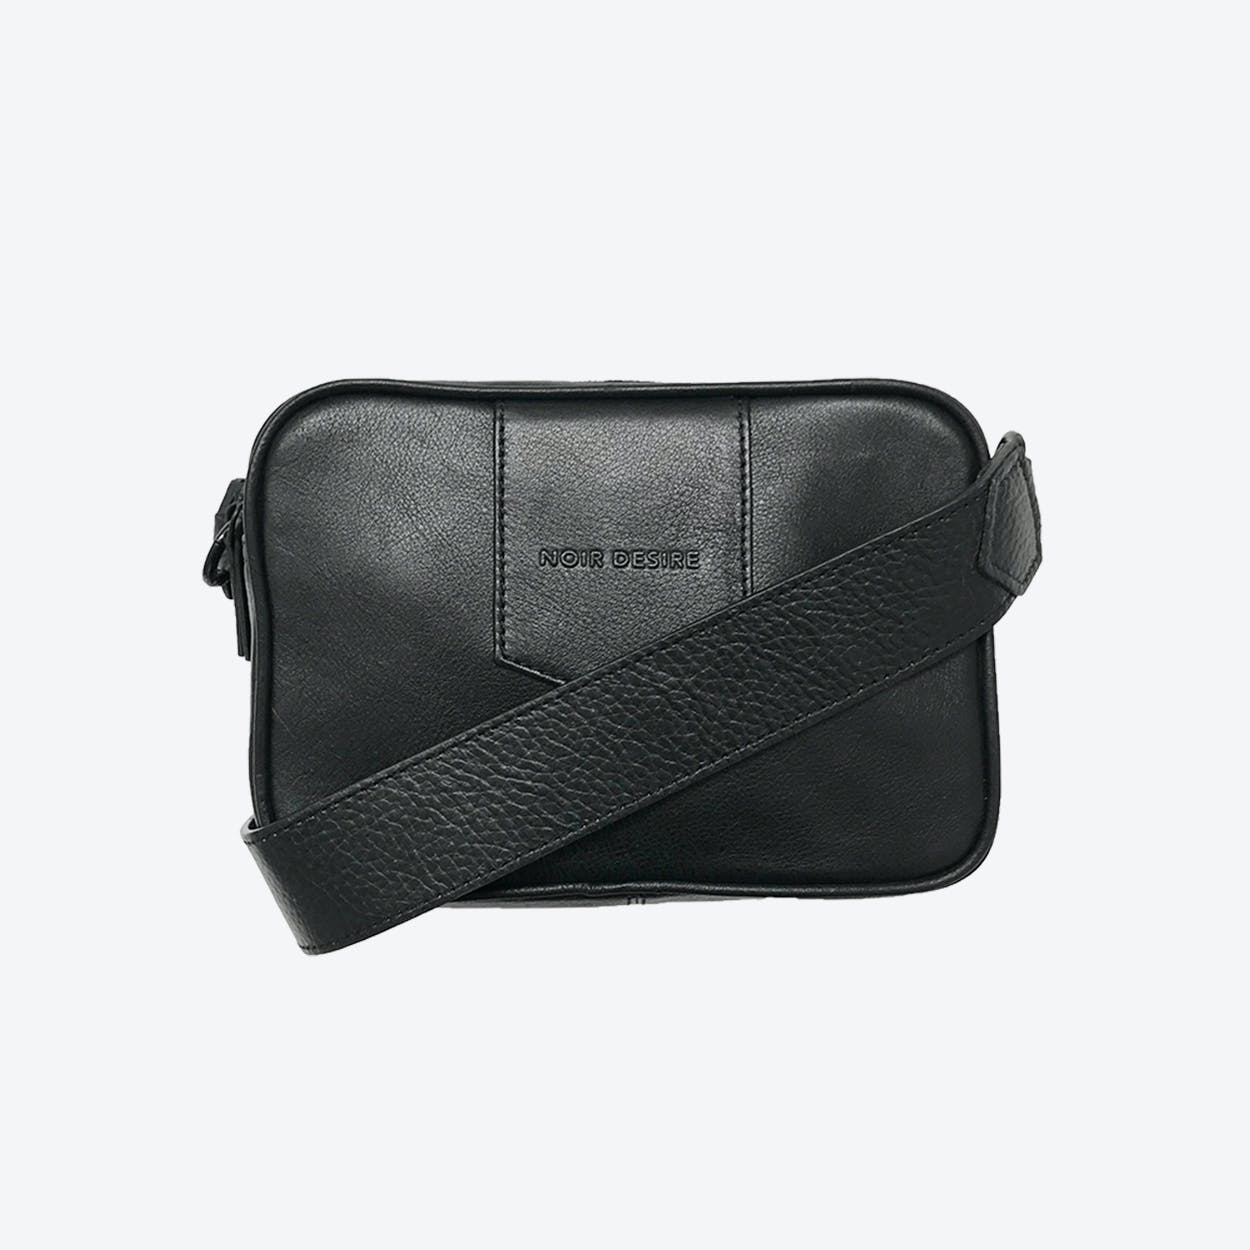 ND Lunel Sort #2 - Crossbody Leather Bag